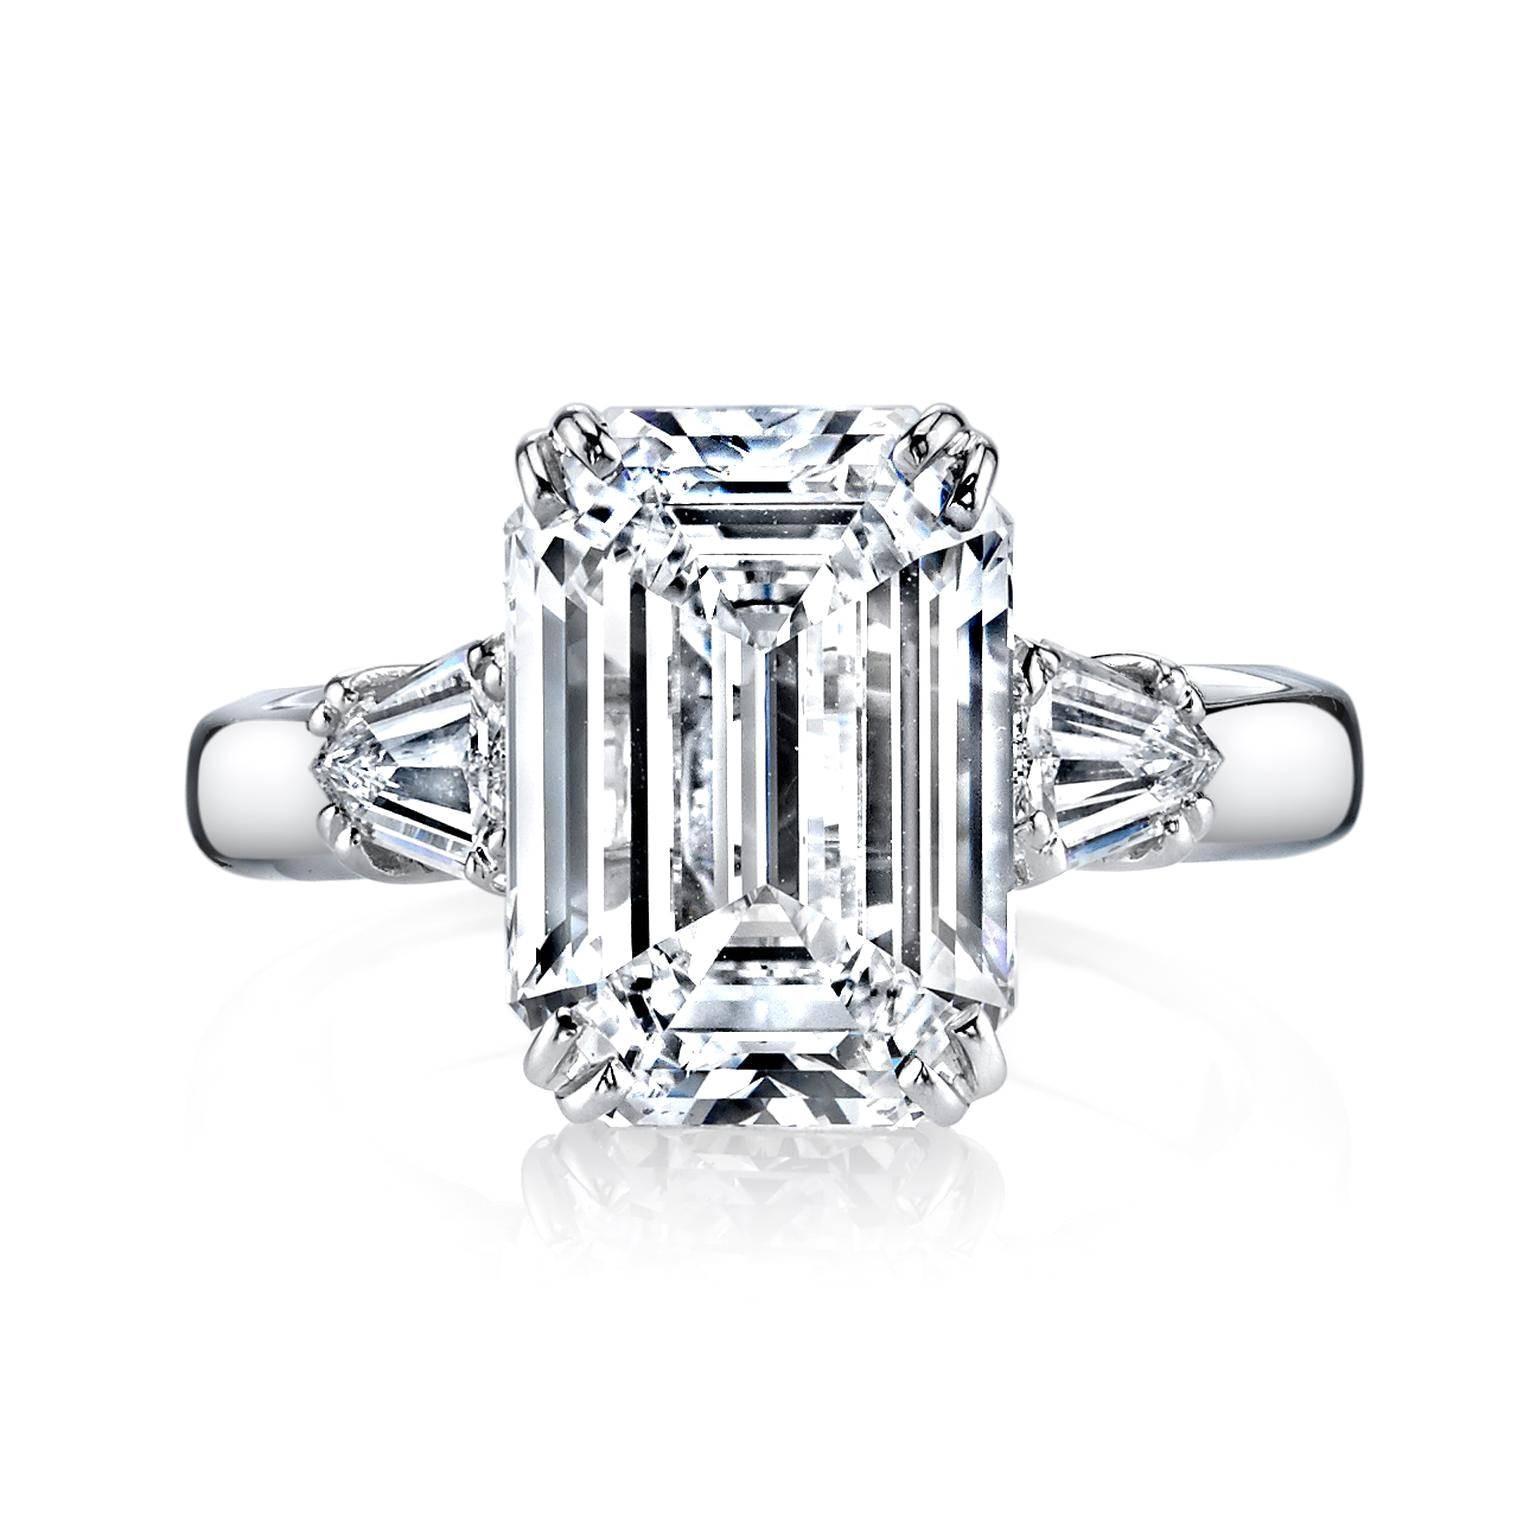 rose quartz vase of diamond wedding theme ideas greatest skull diamond engagement ring with diamond wedding theme ideas greatest skull diamond engagement ring fresh rose quartz wedding ring